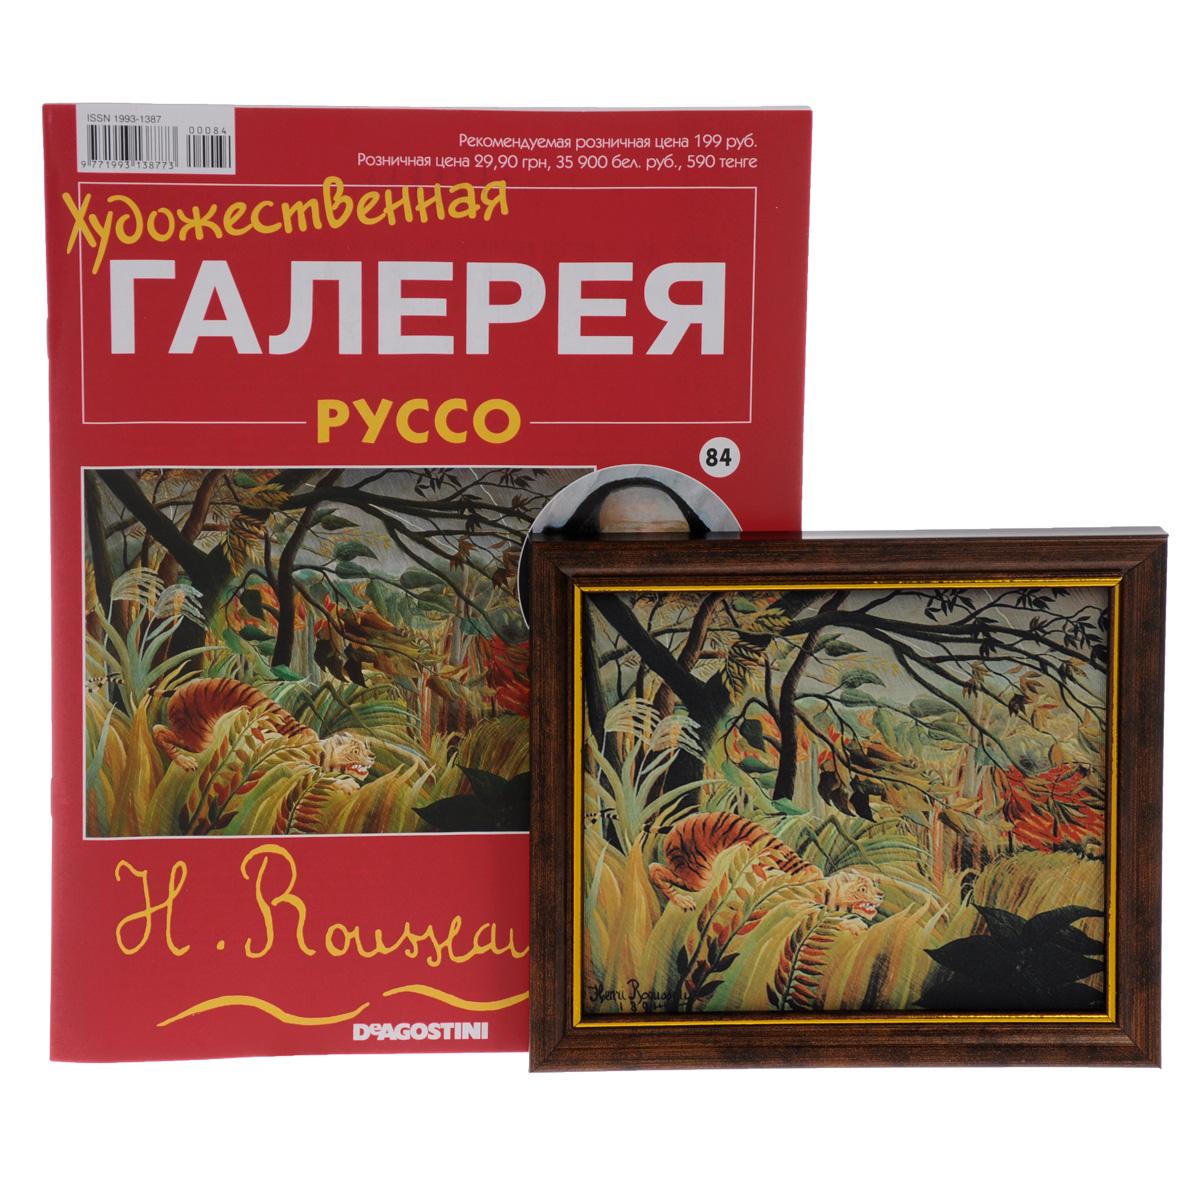 Журнал Художественная галерея № 84 журналы